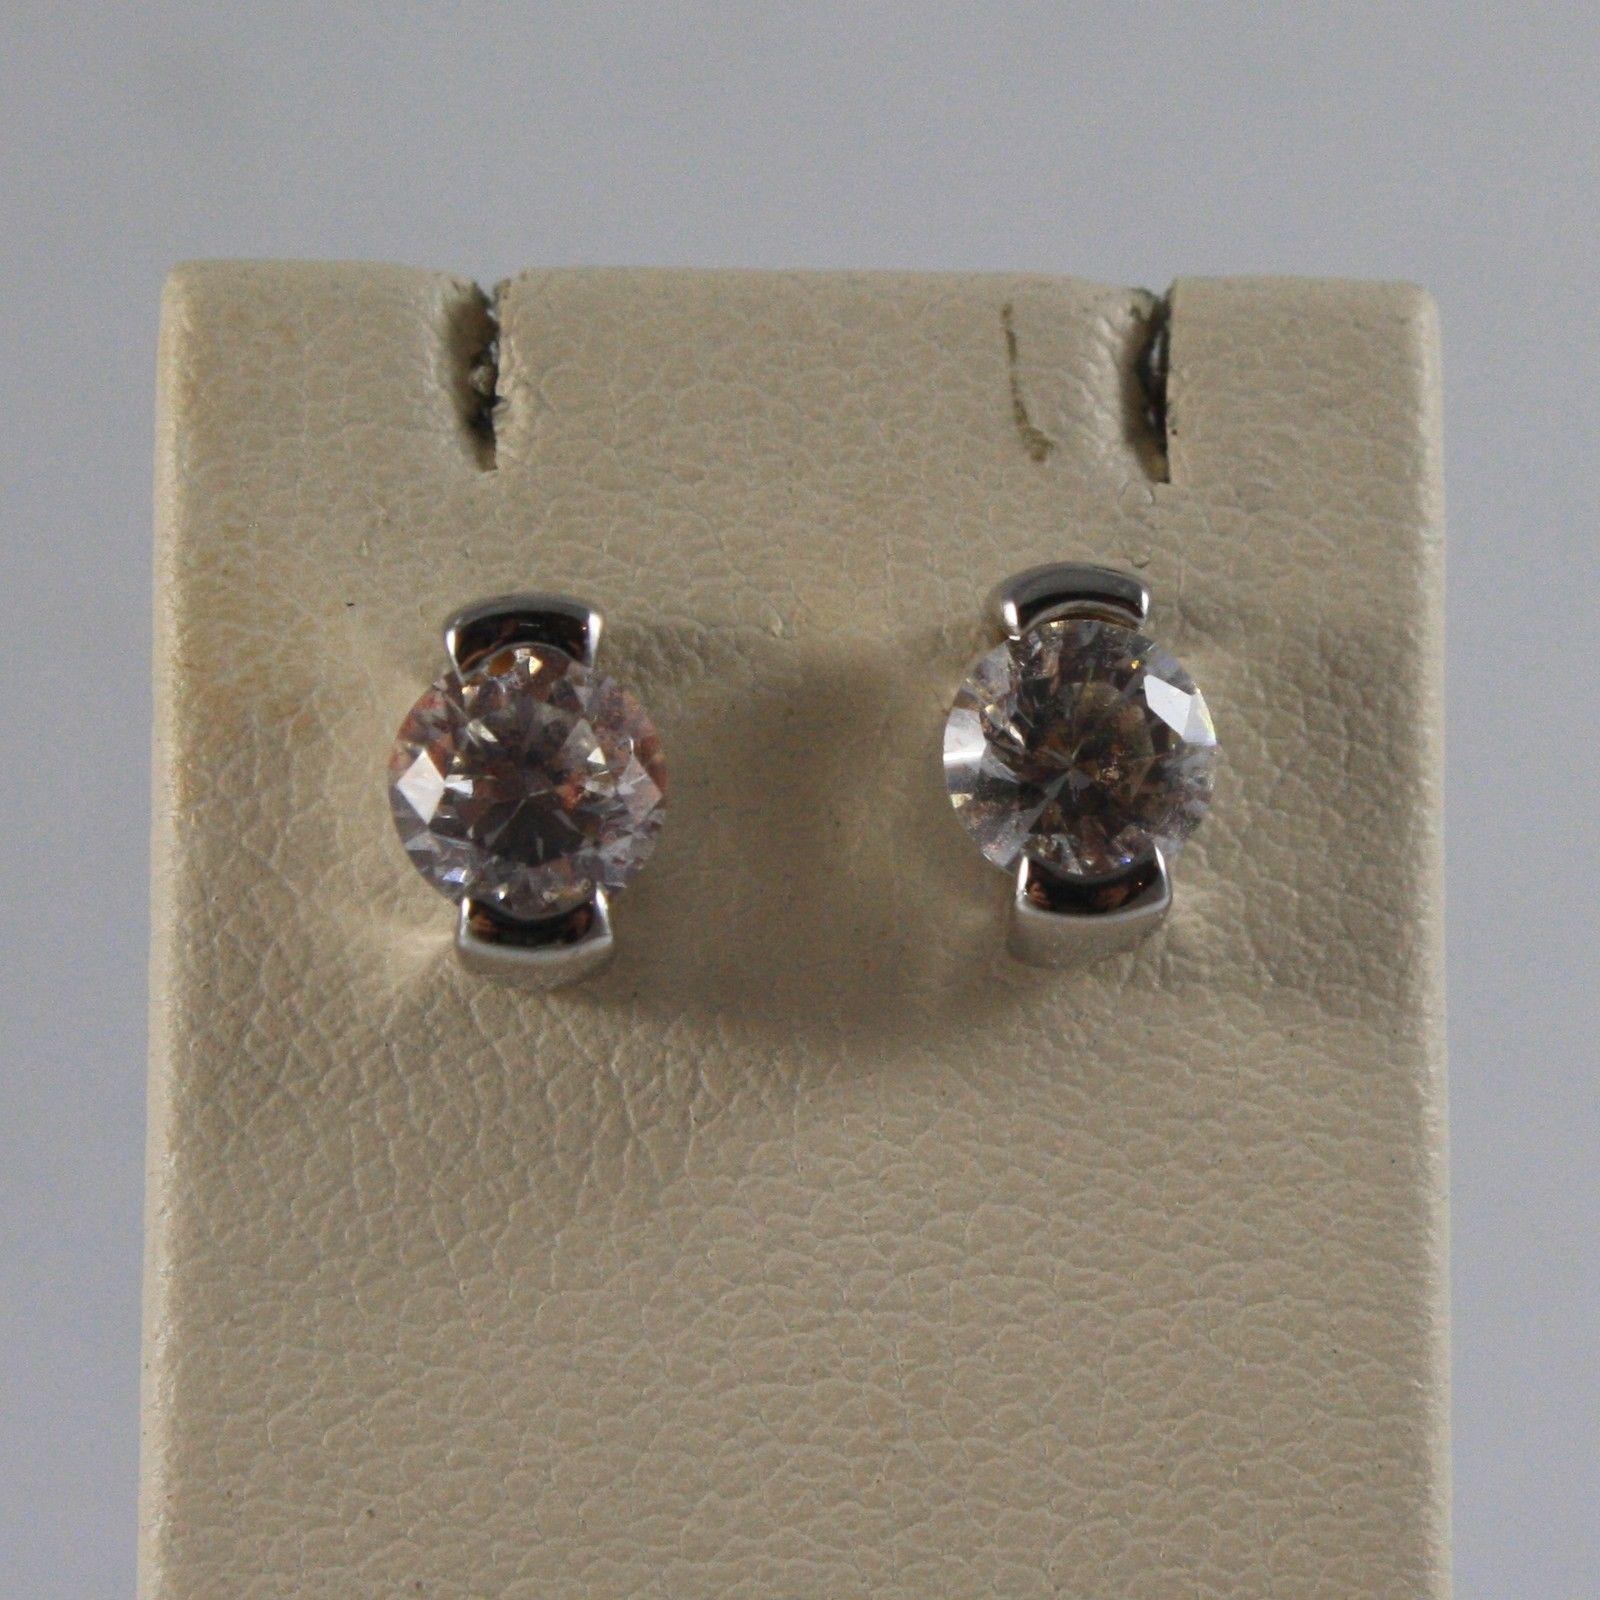 Light Fixture Earrings in White Gold 750 18 CT. Zirconia, 7 MM LONG